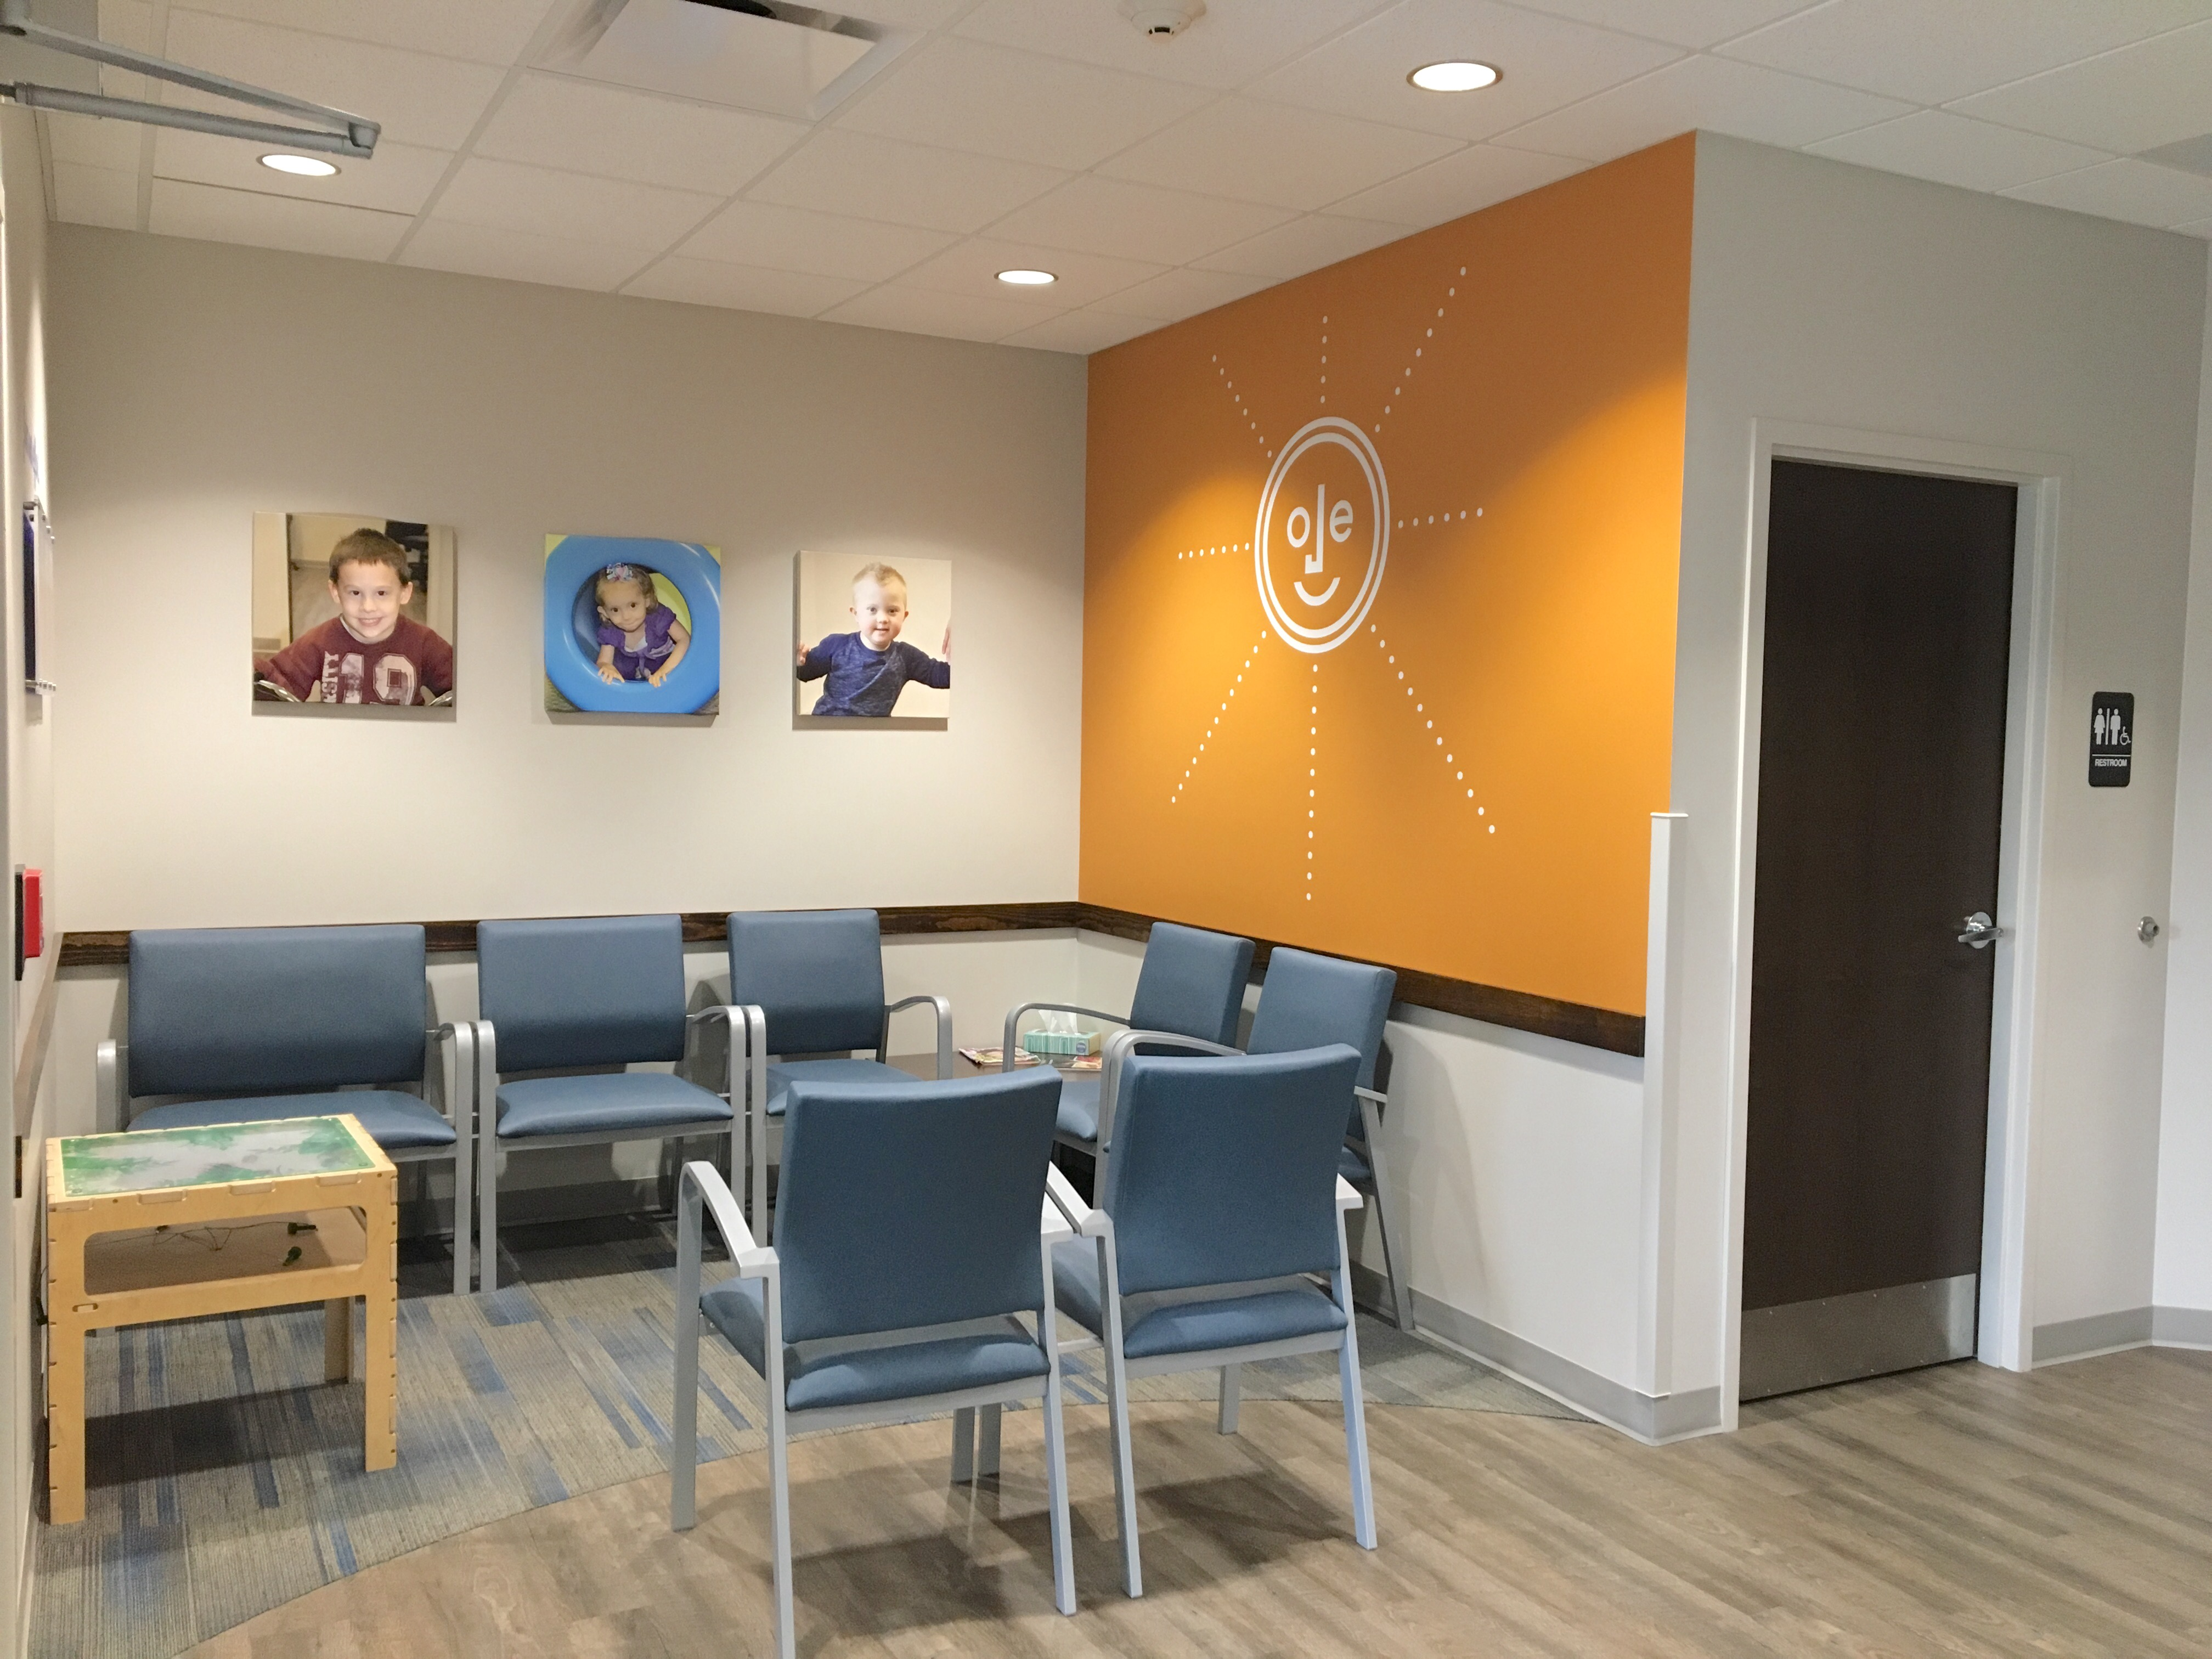 Joe's Kids Waiting Room